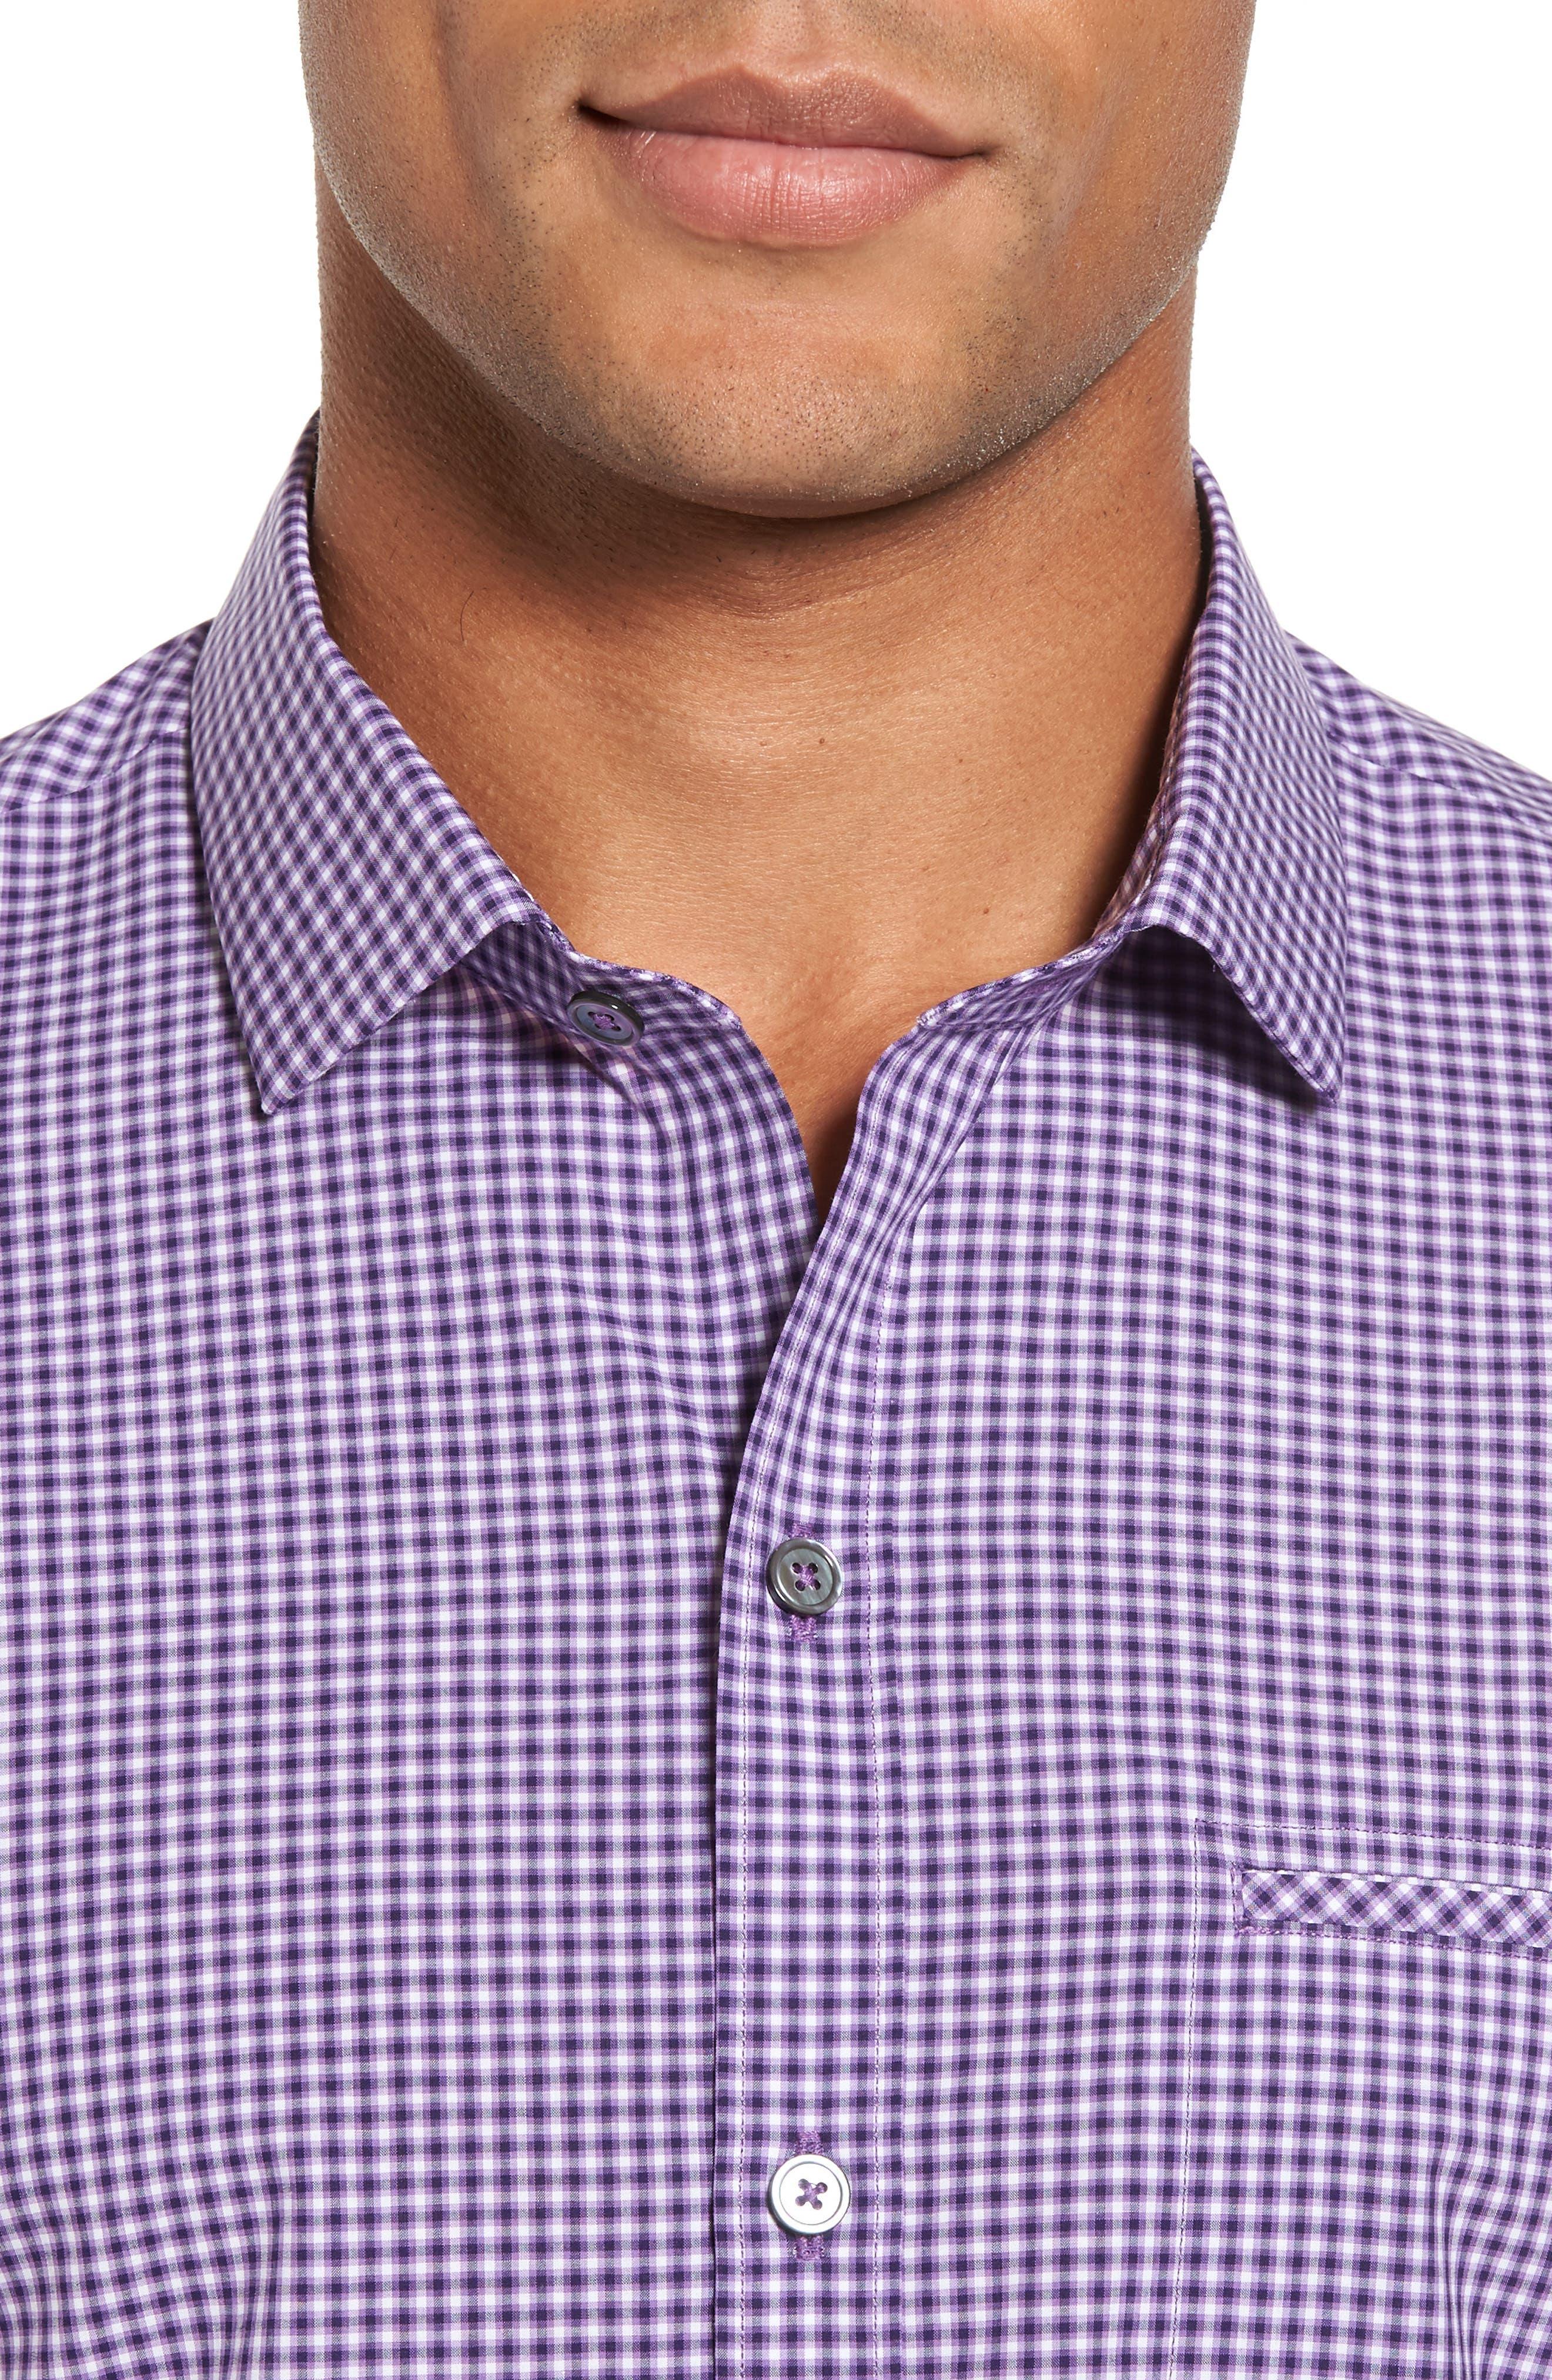 Pawlata Slim Fit Check Sport Shirt,                             Alternate thumbnail 4, color,                             500